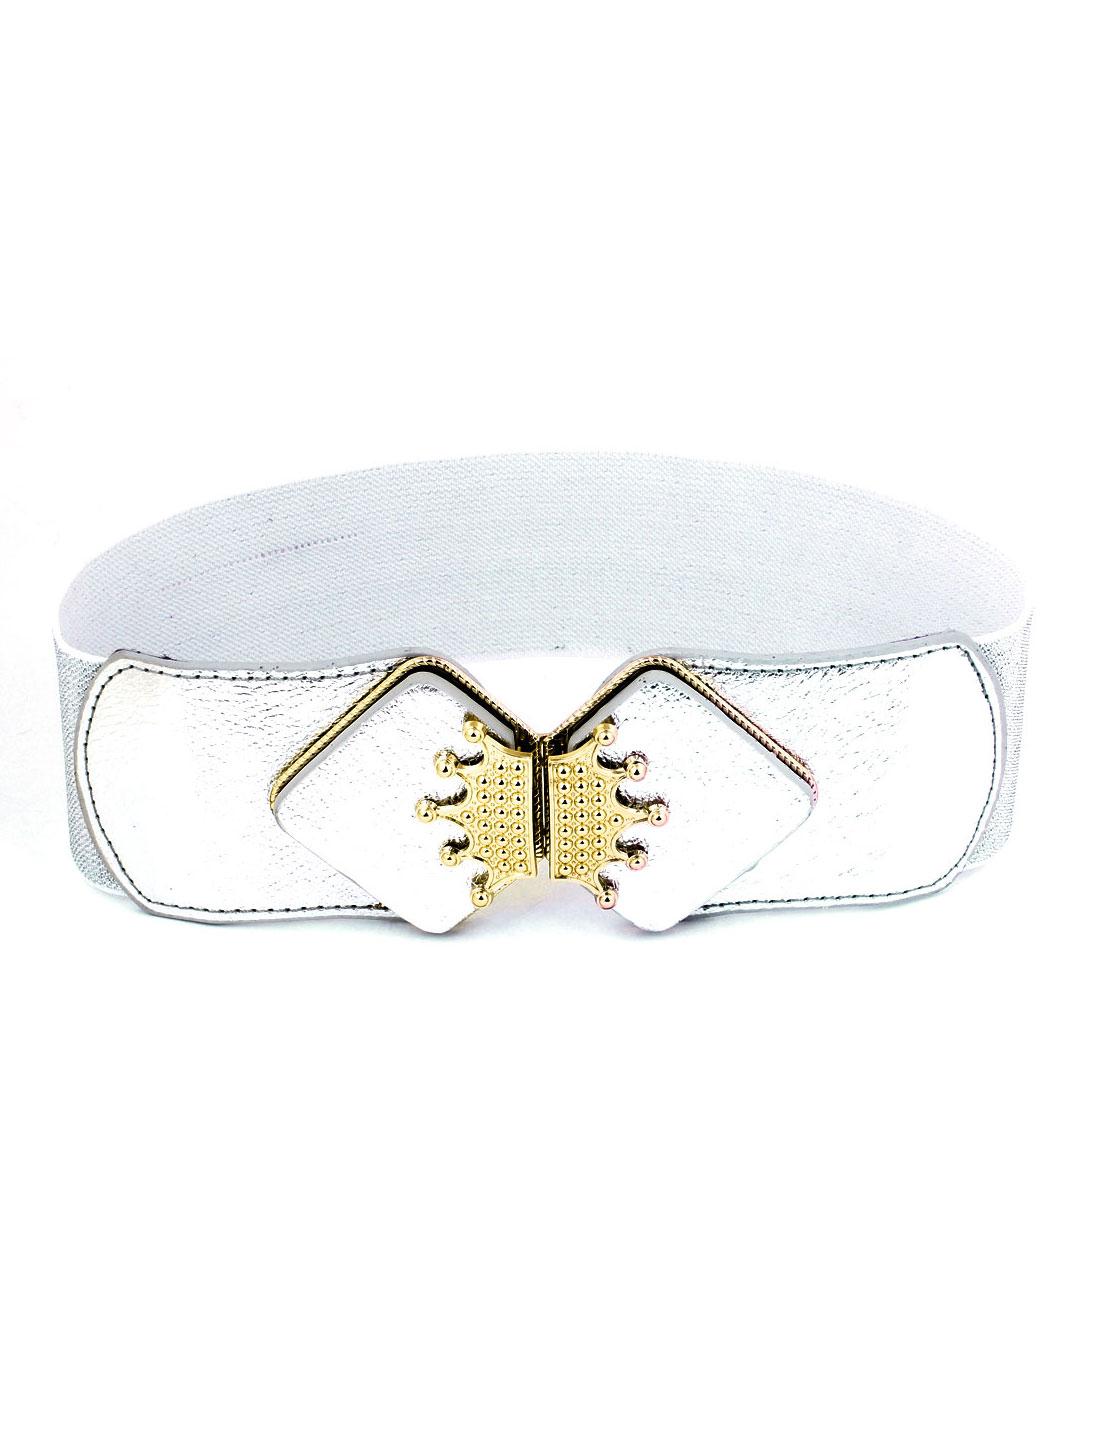 6cm Wide Metal Crown Detail Elastic Fabric Cinch Belt for Women